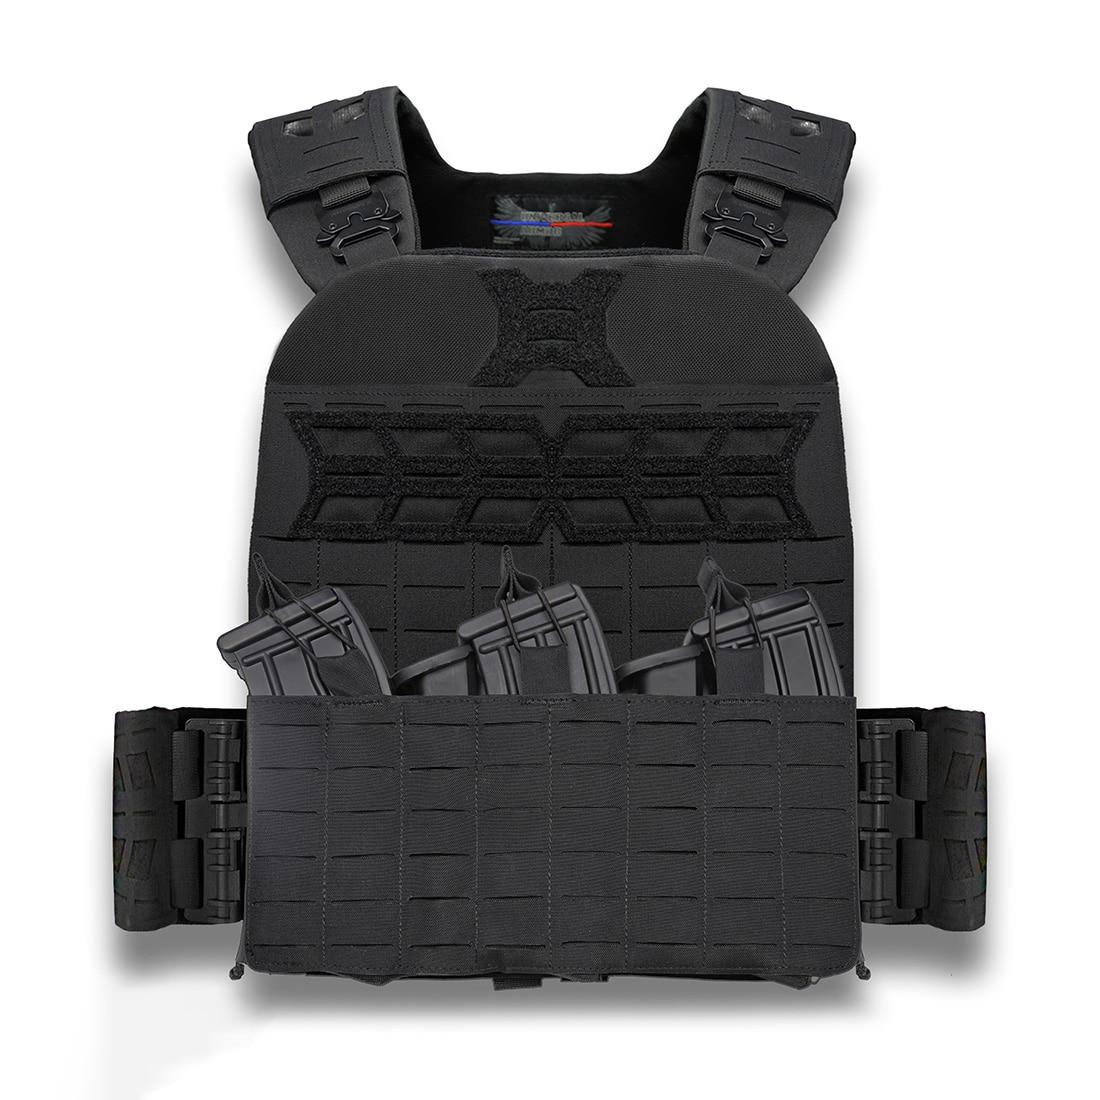 UTA Gen2 Universal Armor Quick Reverse Tactical Vest - Black Flame Retardant Standard Type